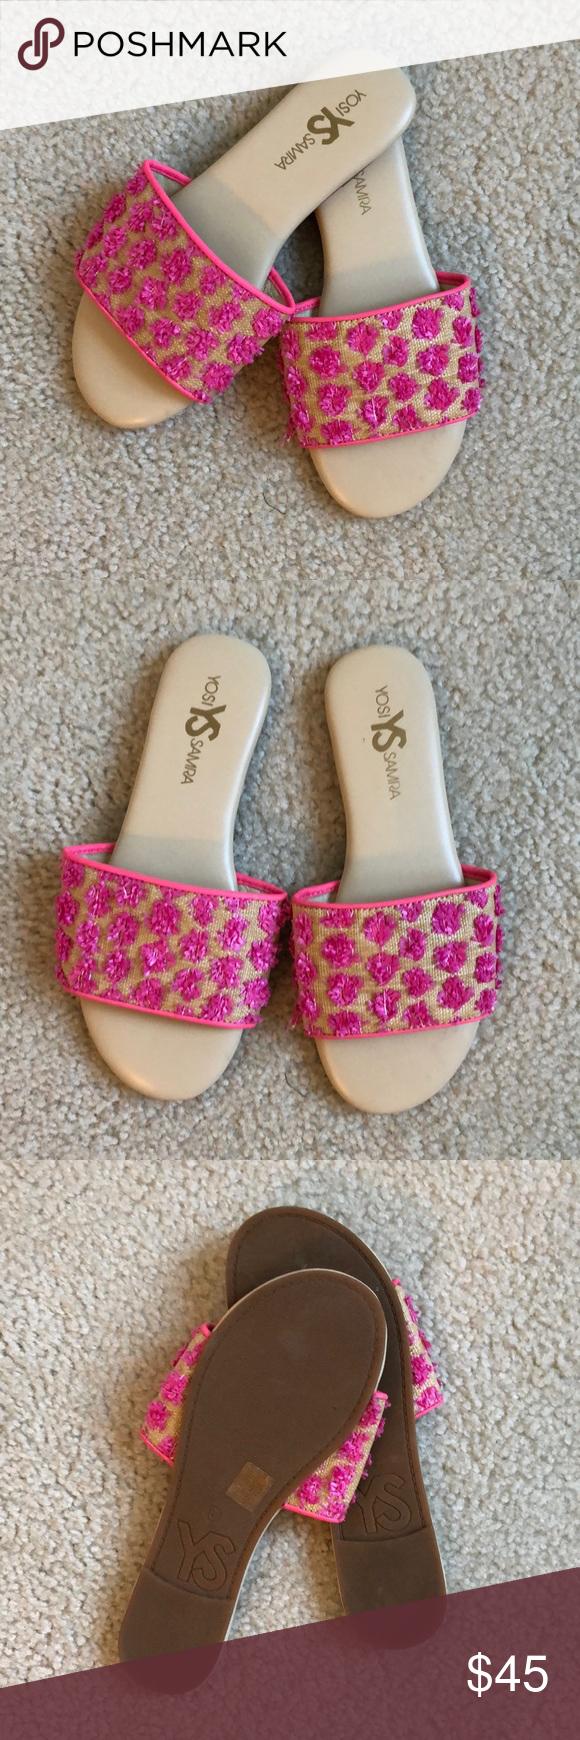 53c8335c9ac8 Yosi Samra Women s Reese Slide Sandals - Color  Pink Lemonade - Heel  measures approximately 0.5 inches